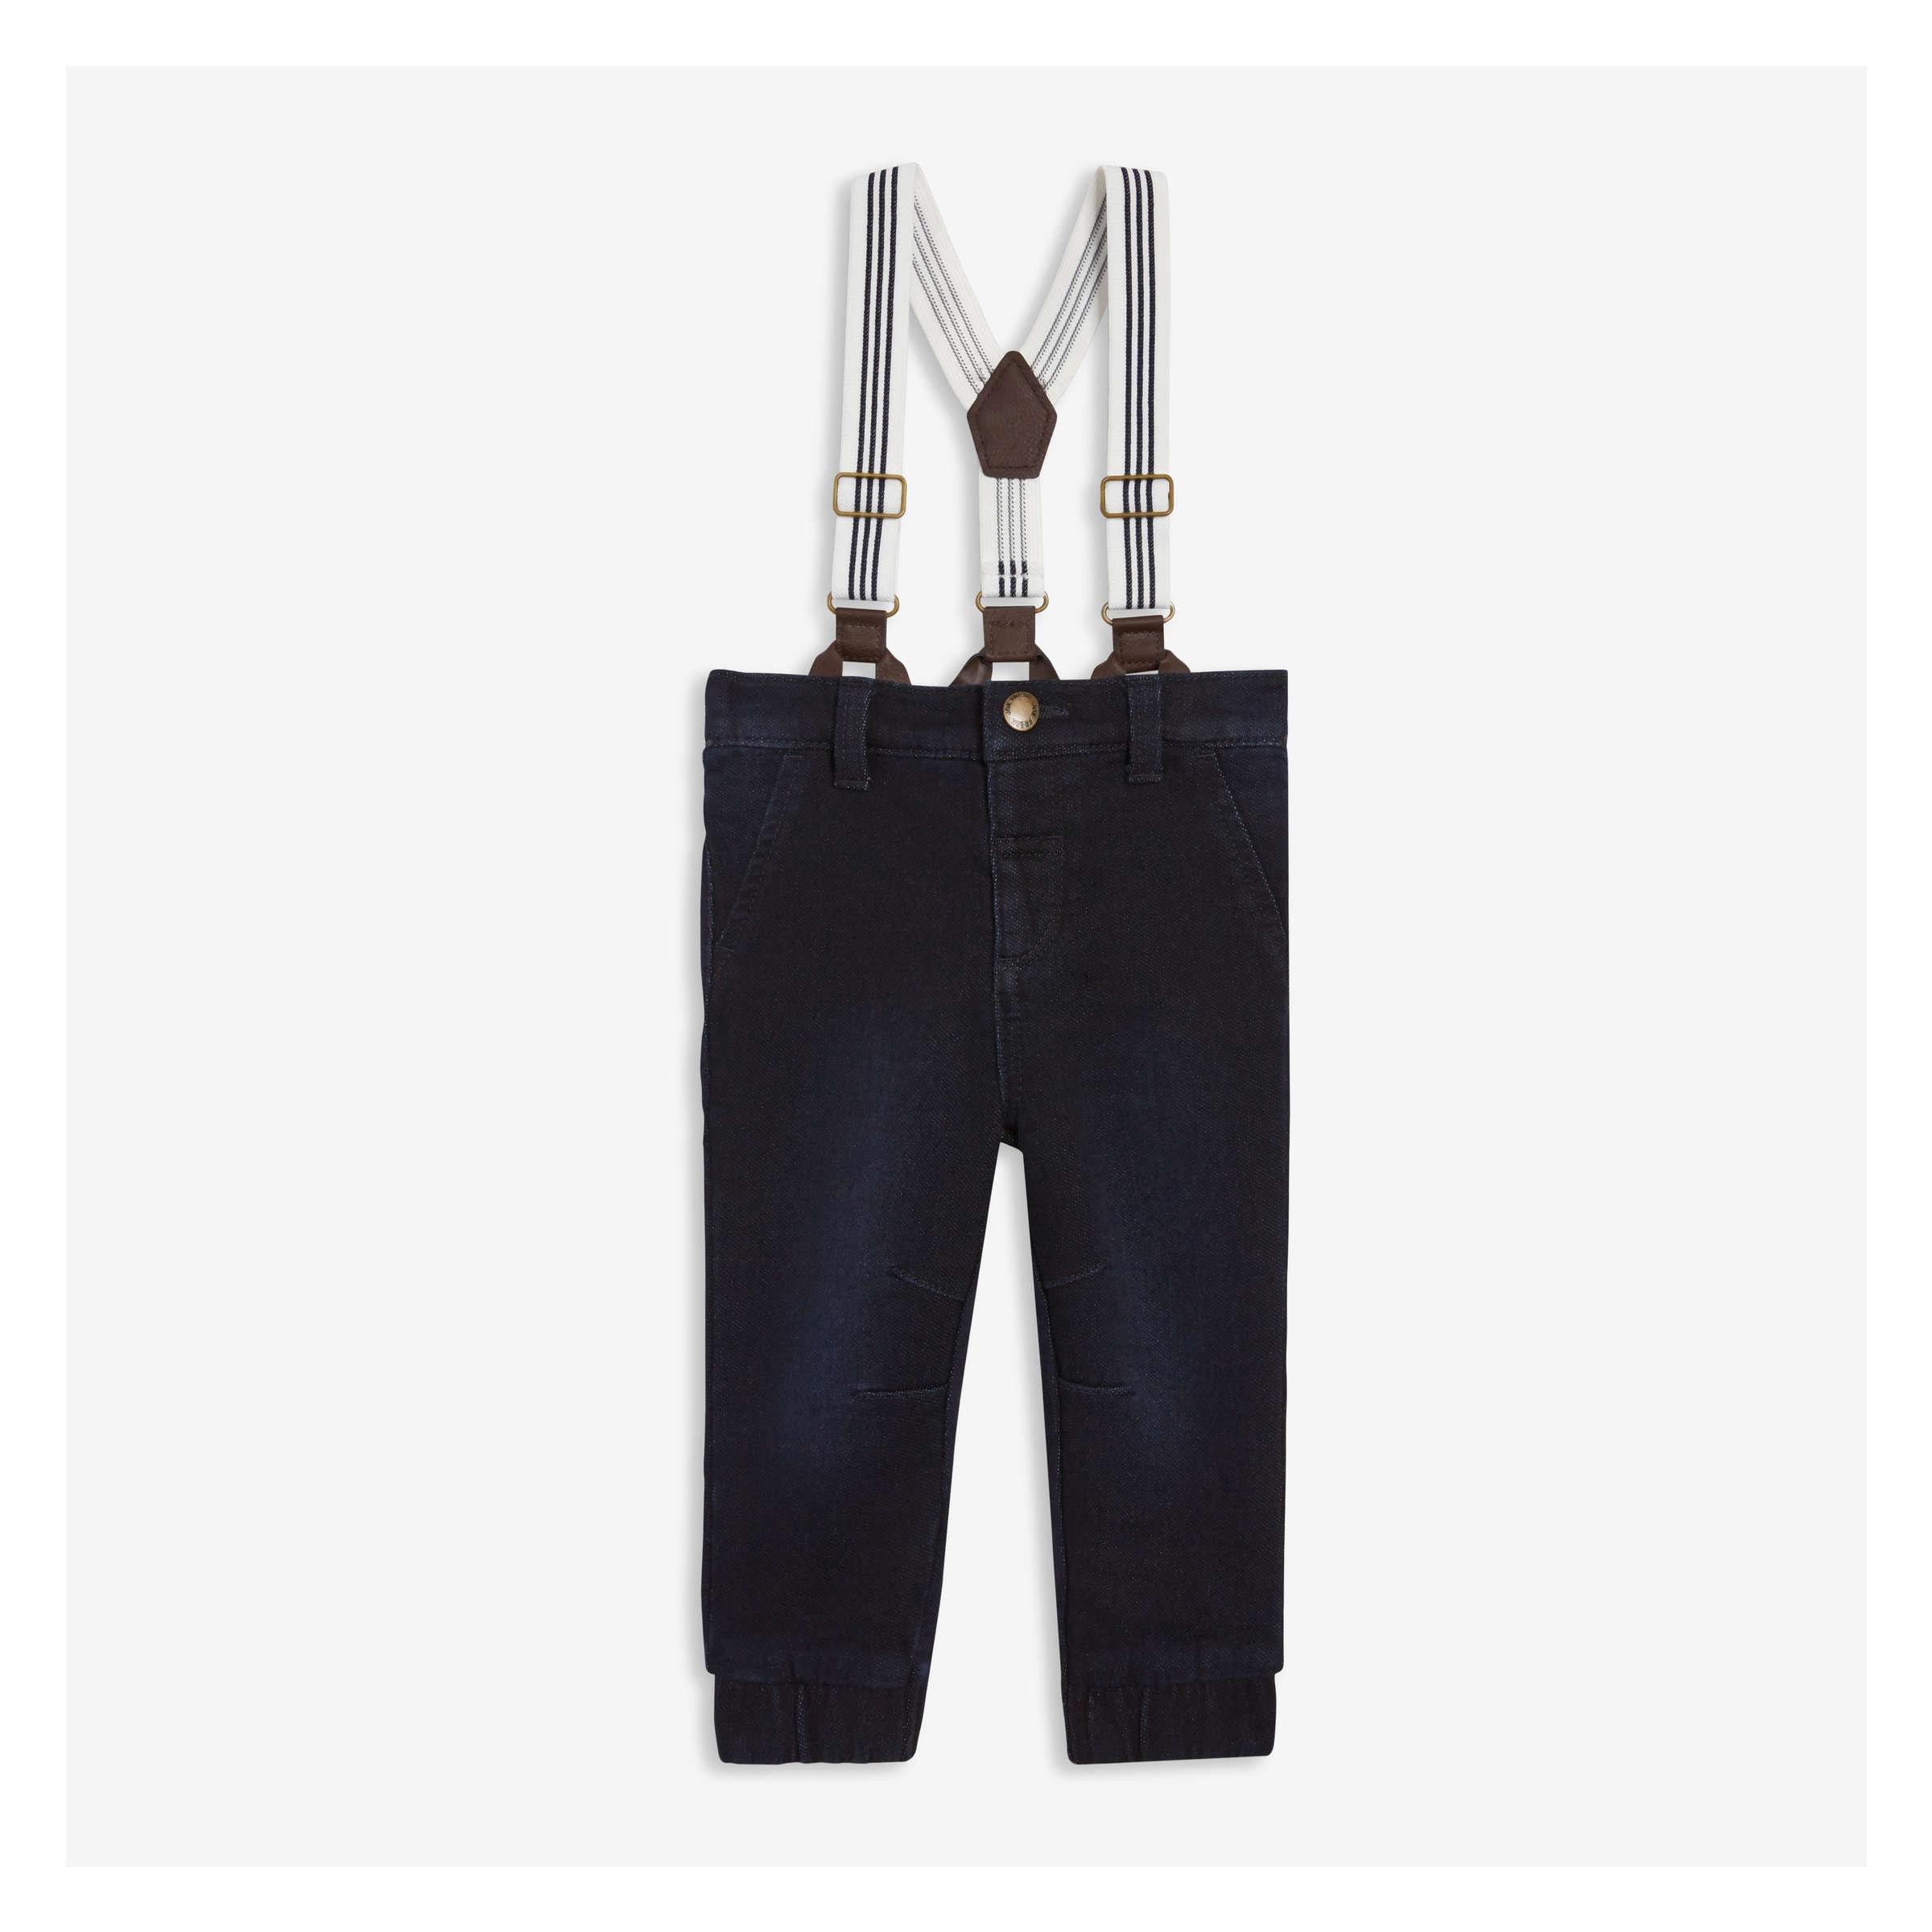 bb95bf896f56c Joe Fresh Baby Boys' Pant with Suspenders